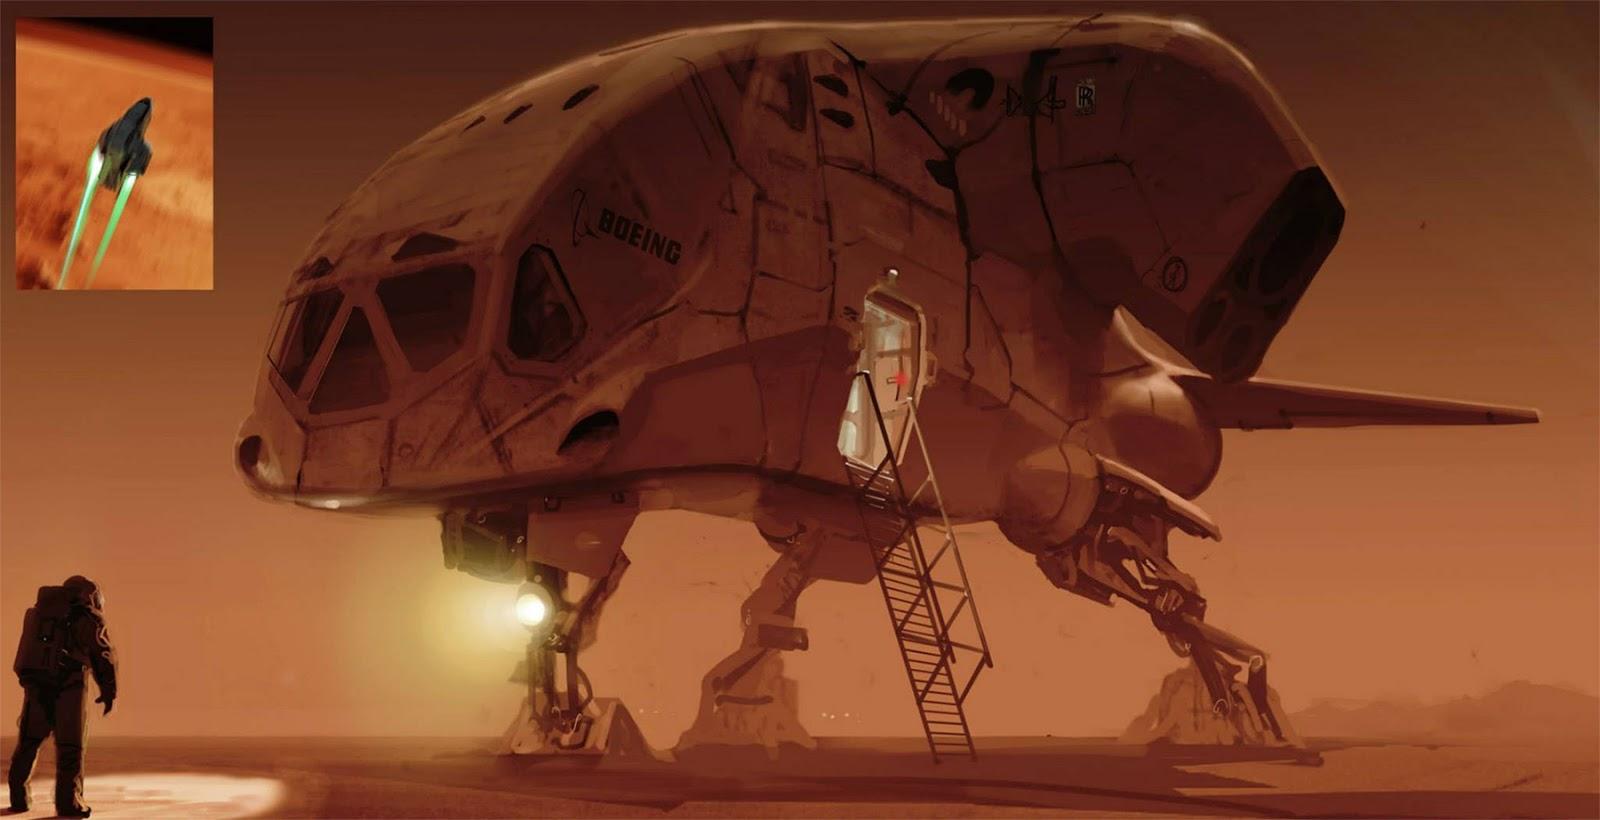 Boeing Mars lander concept by Romek Delimata